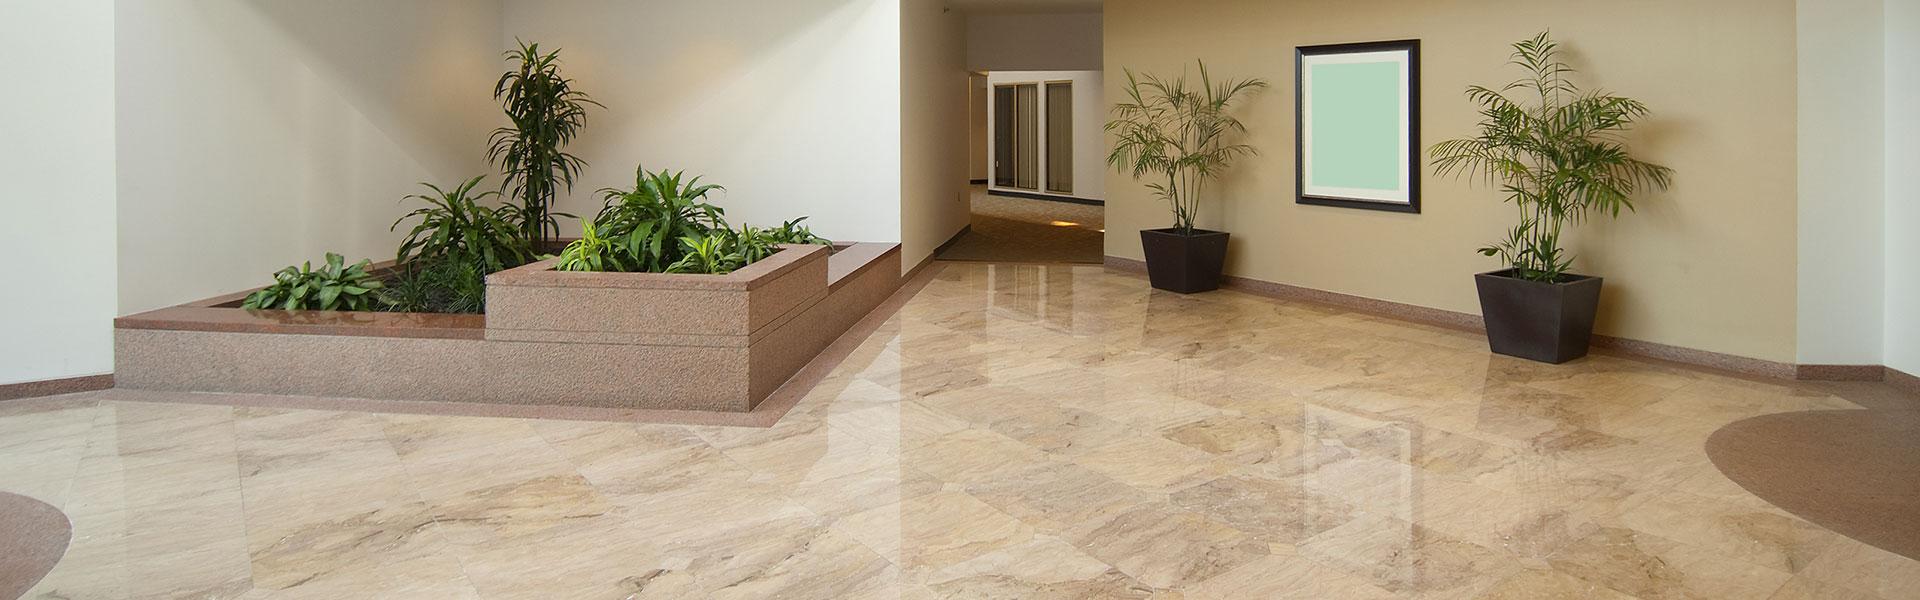 Sonoma County Tiling Company